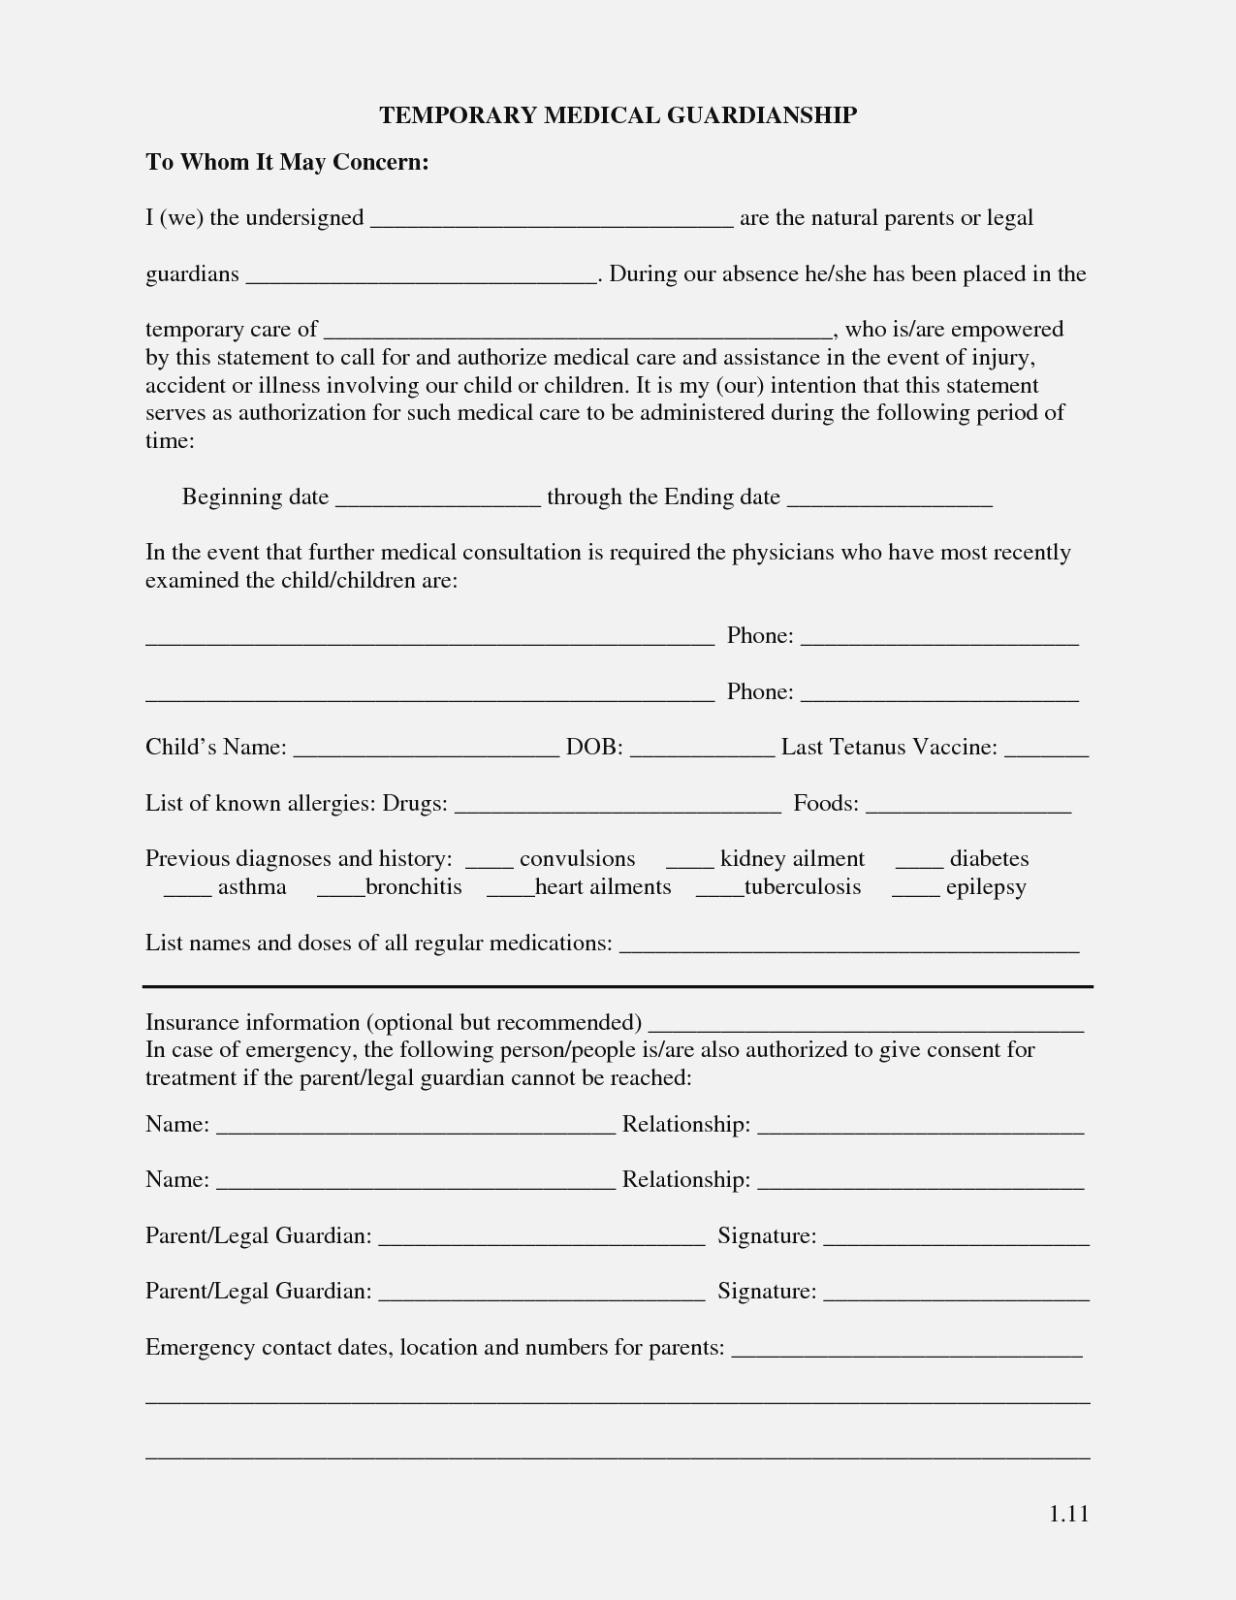 Free Printable Temporary Guardianship Forms   Forms   Pinterest - Free Printable Guardianship Forms